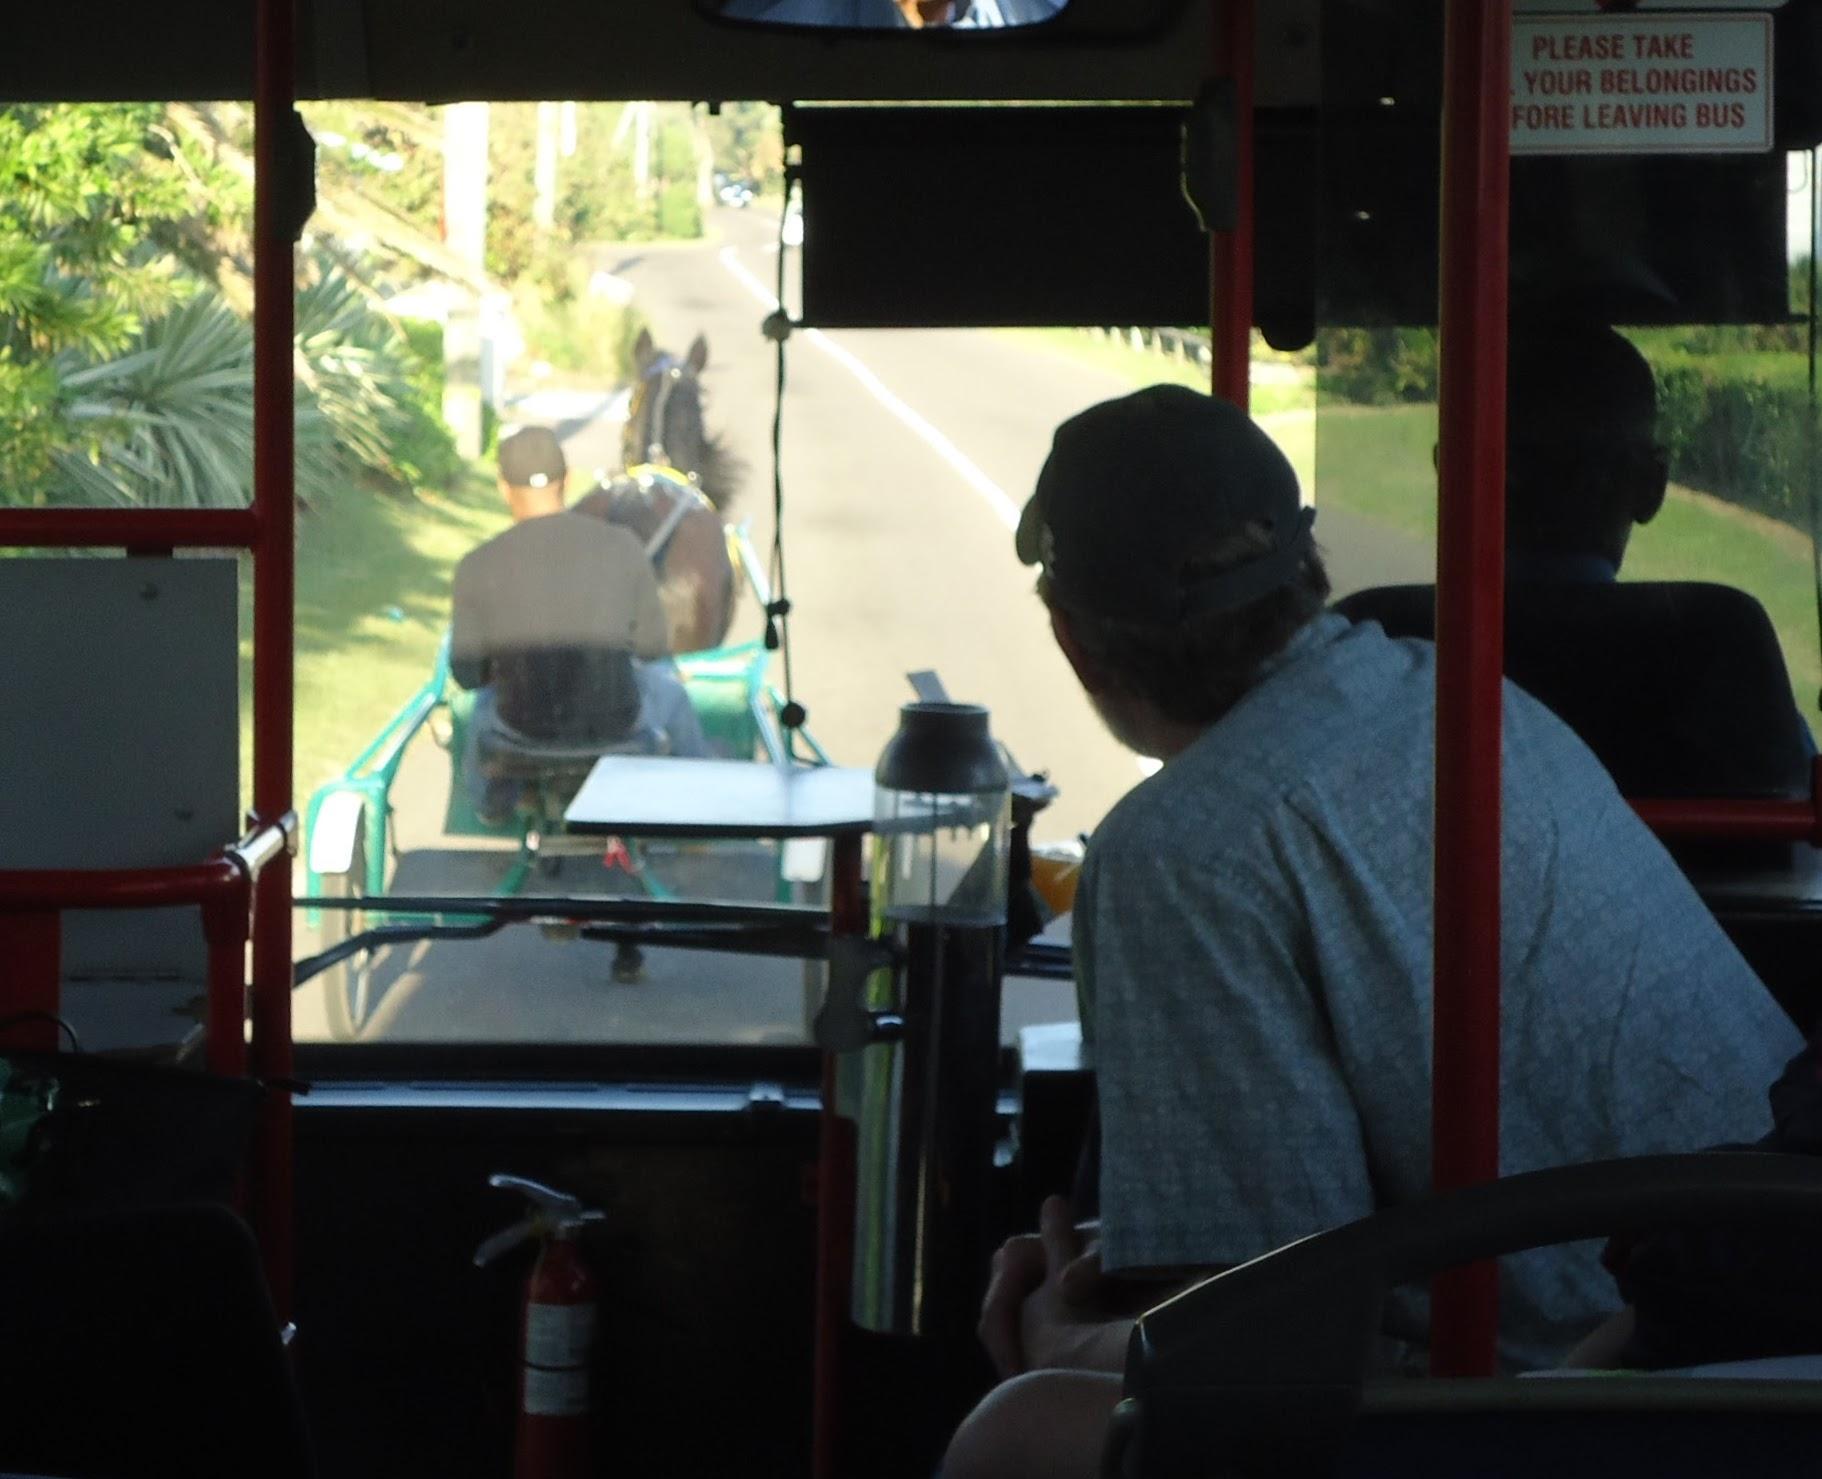 File:Bermuda (UK) photos number 40 view from bus behind